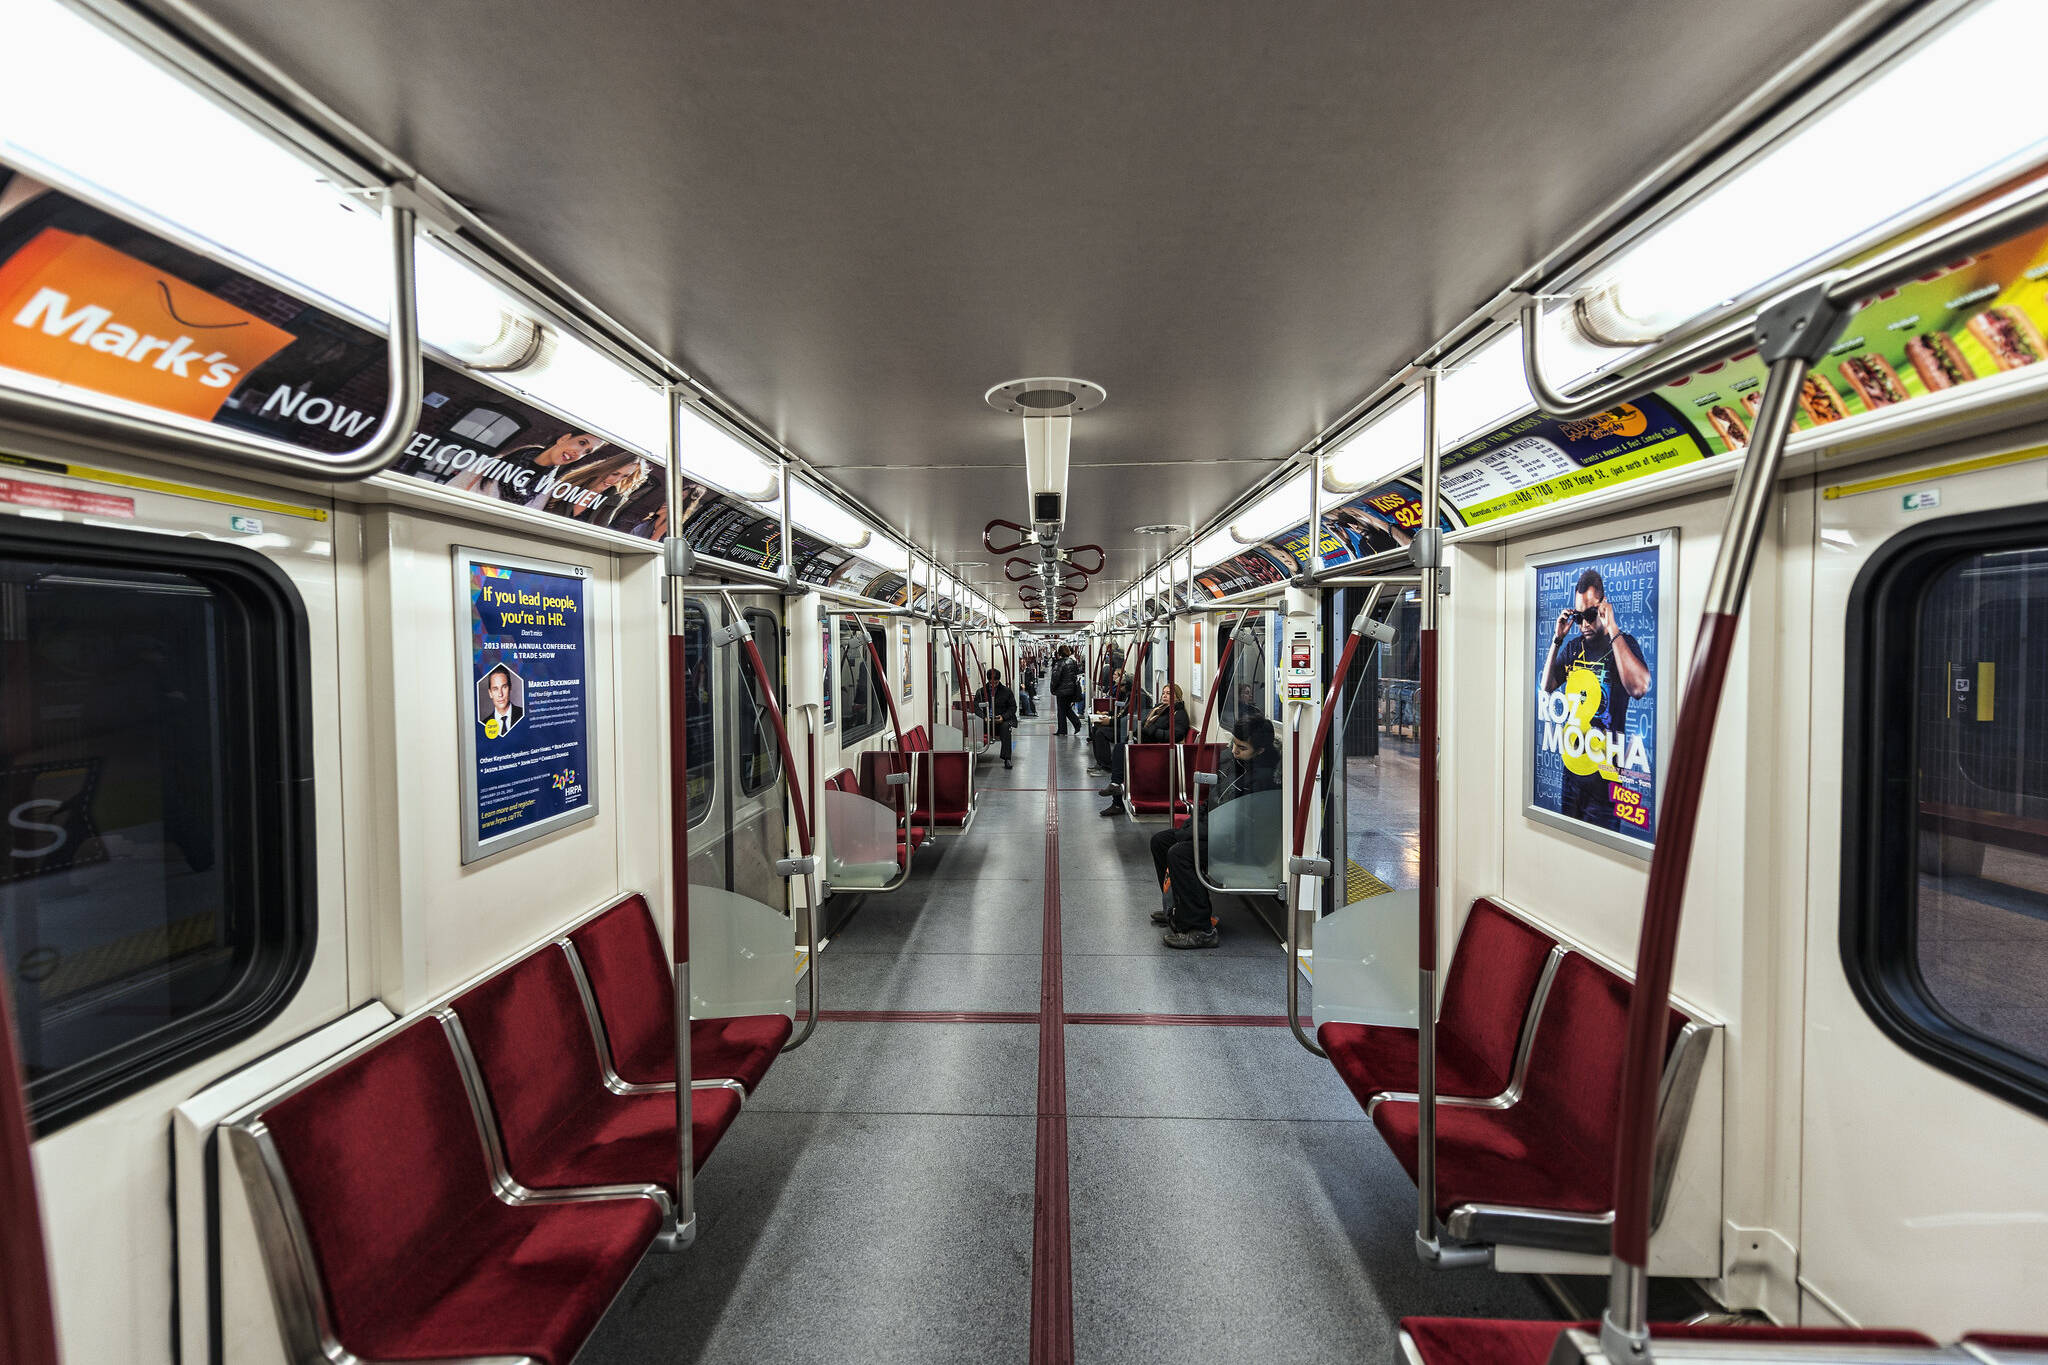 TTC subway guard